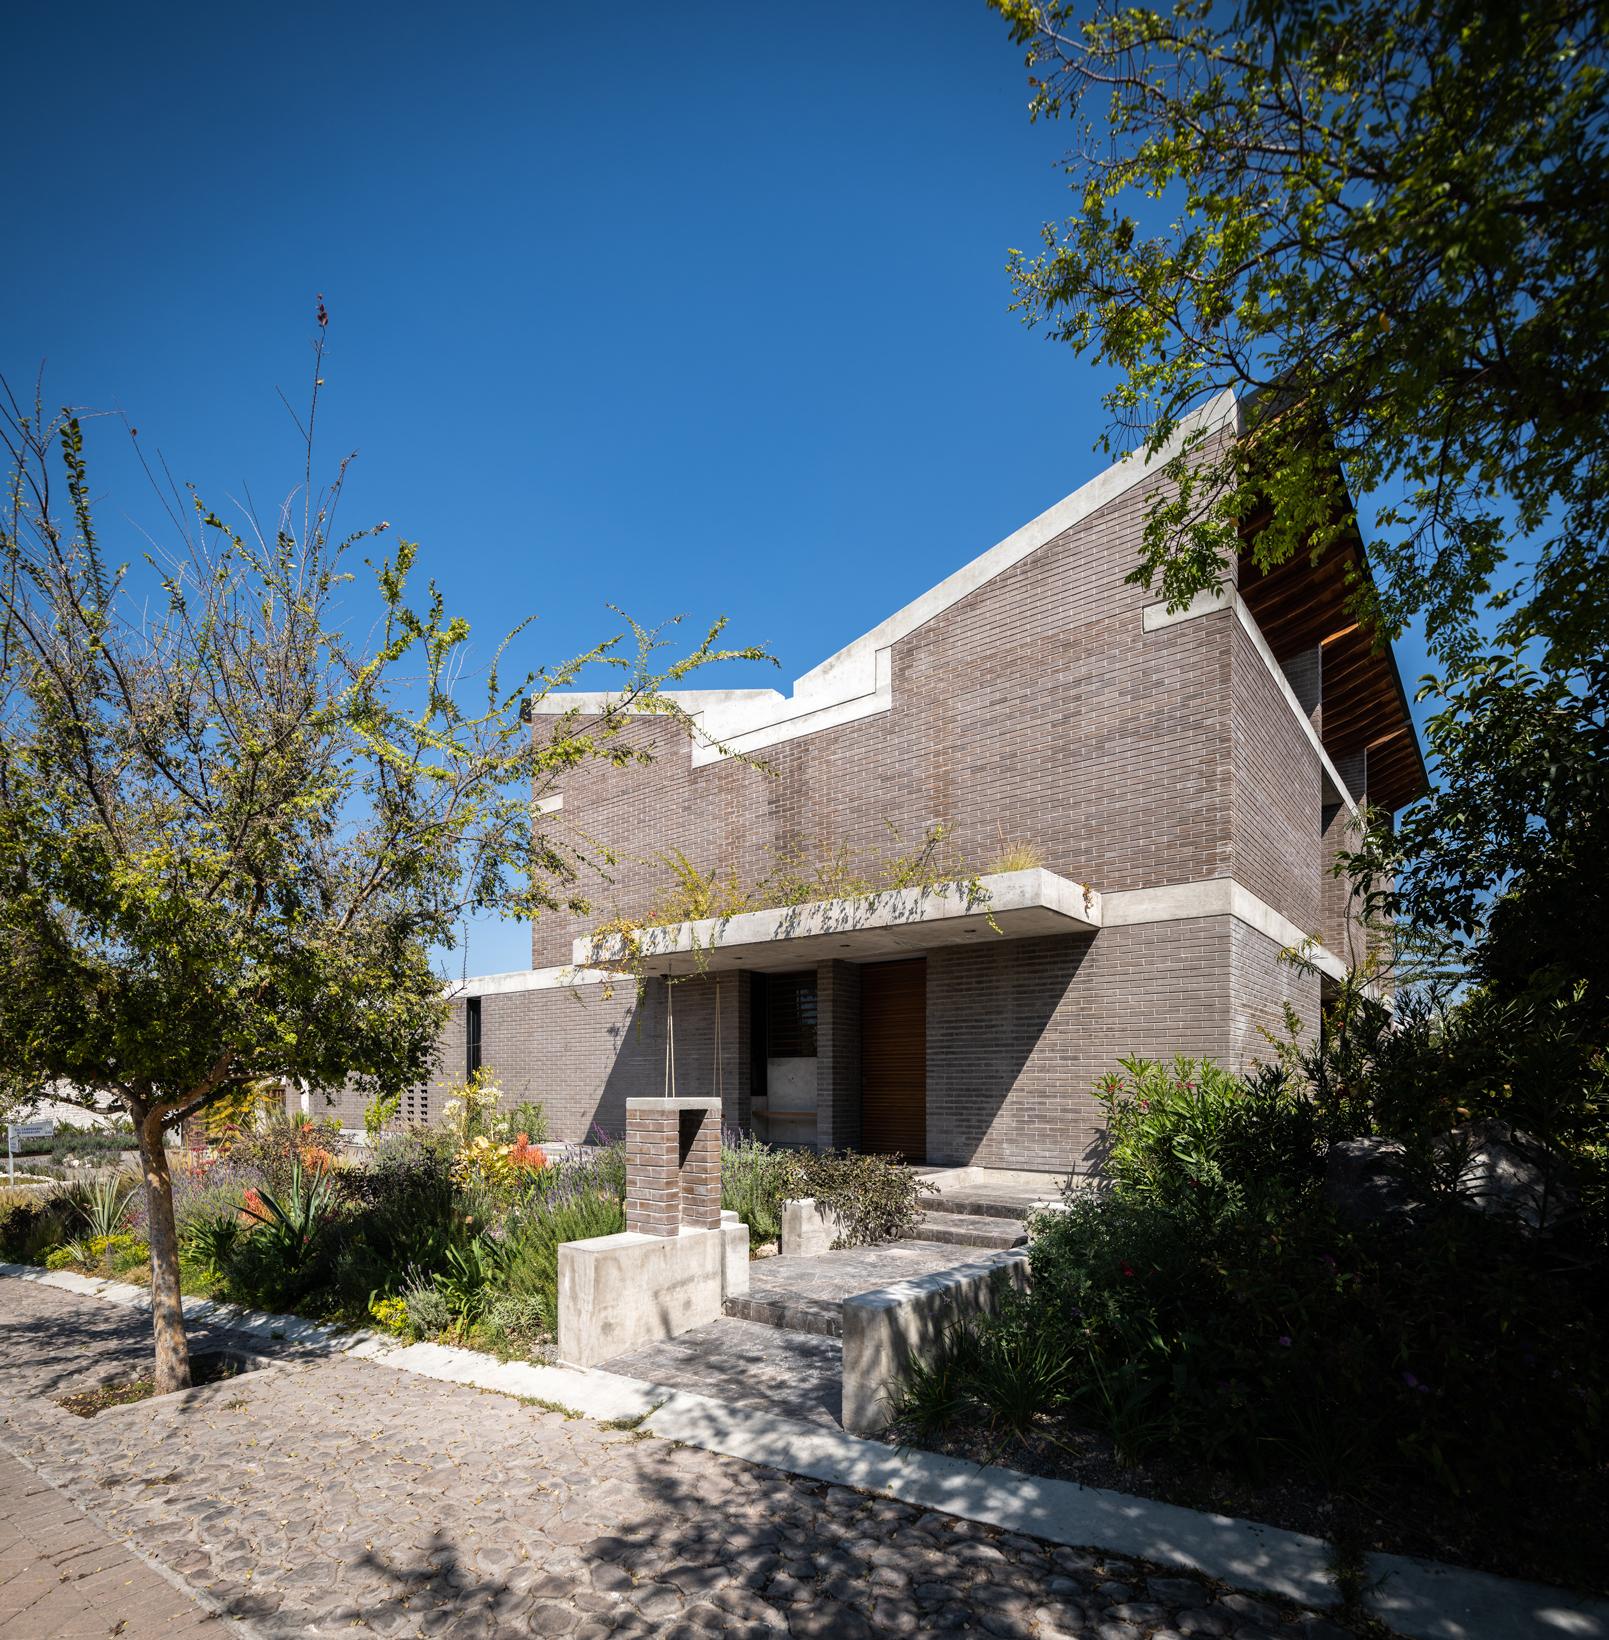 Birlain House